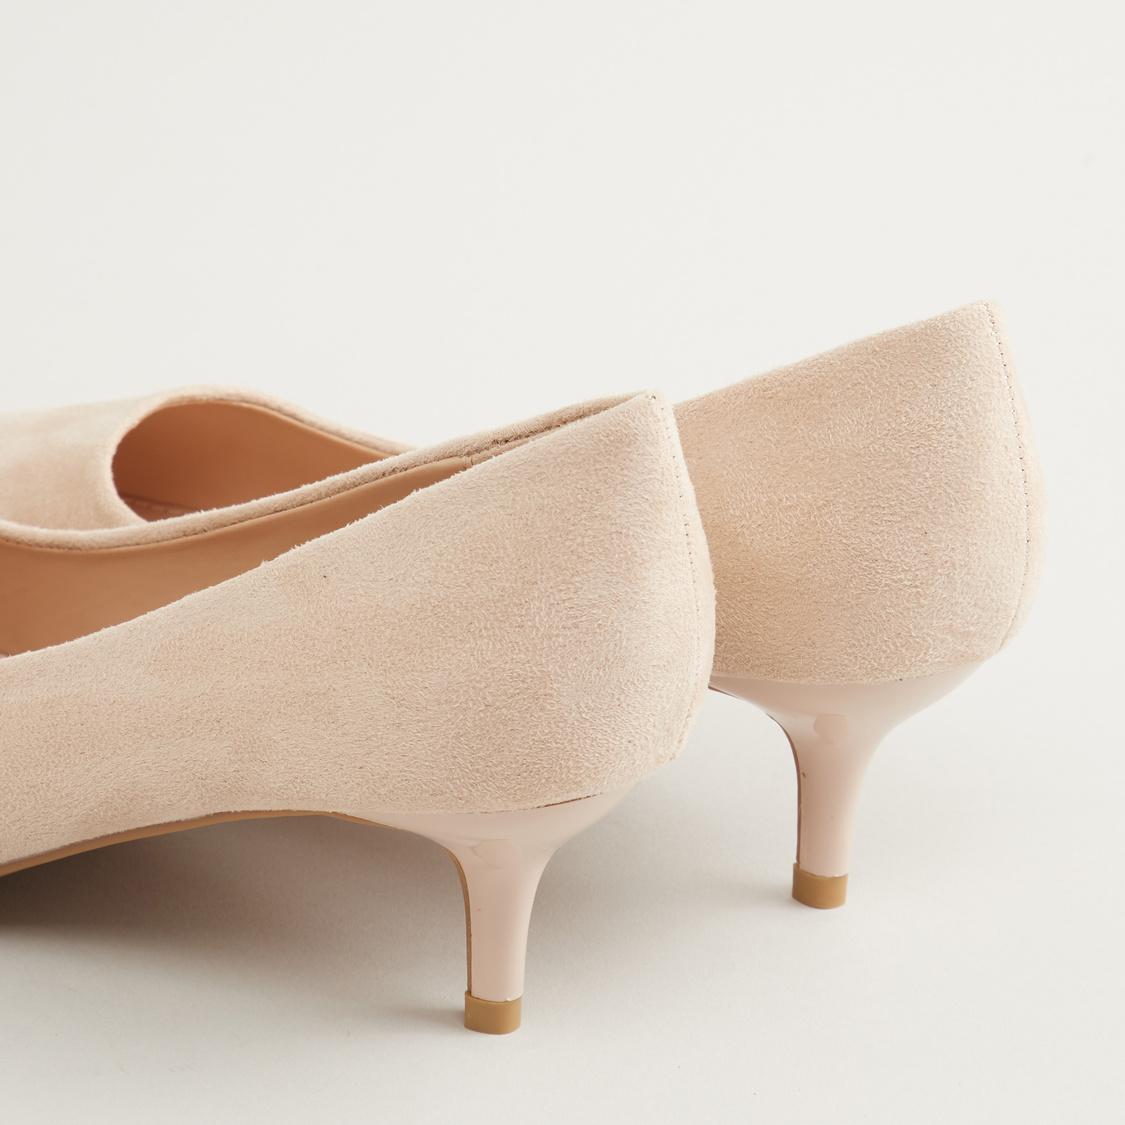 Textured Slip On Pumps with Kitten Heels